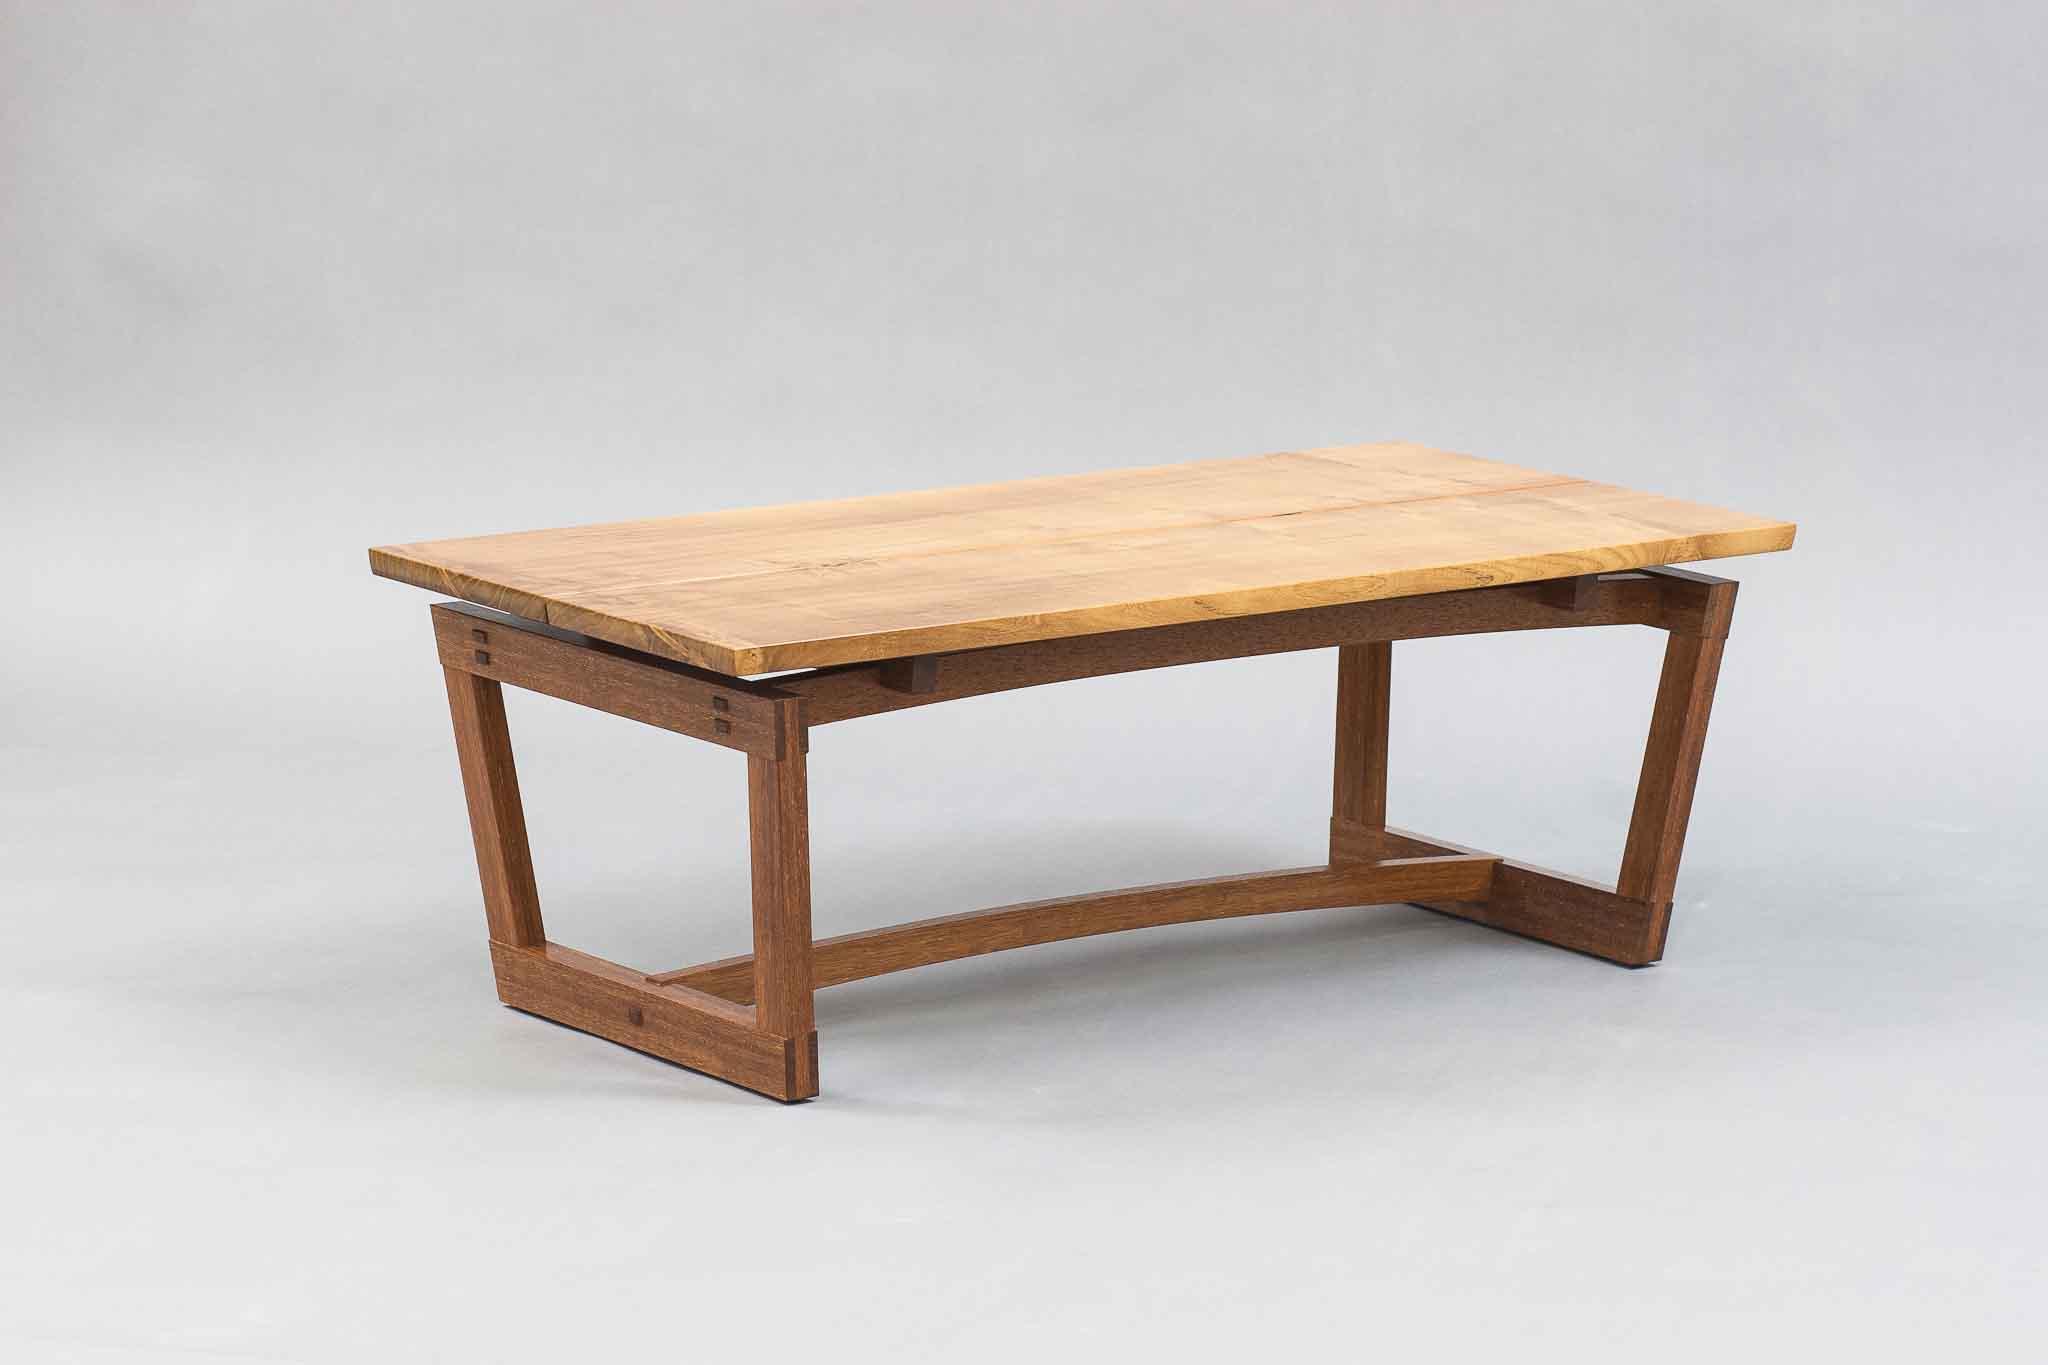 Coffee Table The Krenov School Of Fine Furniture